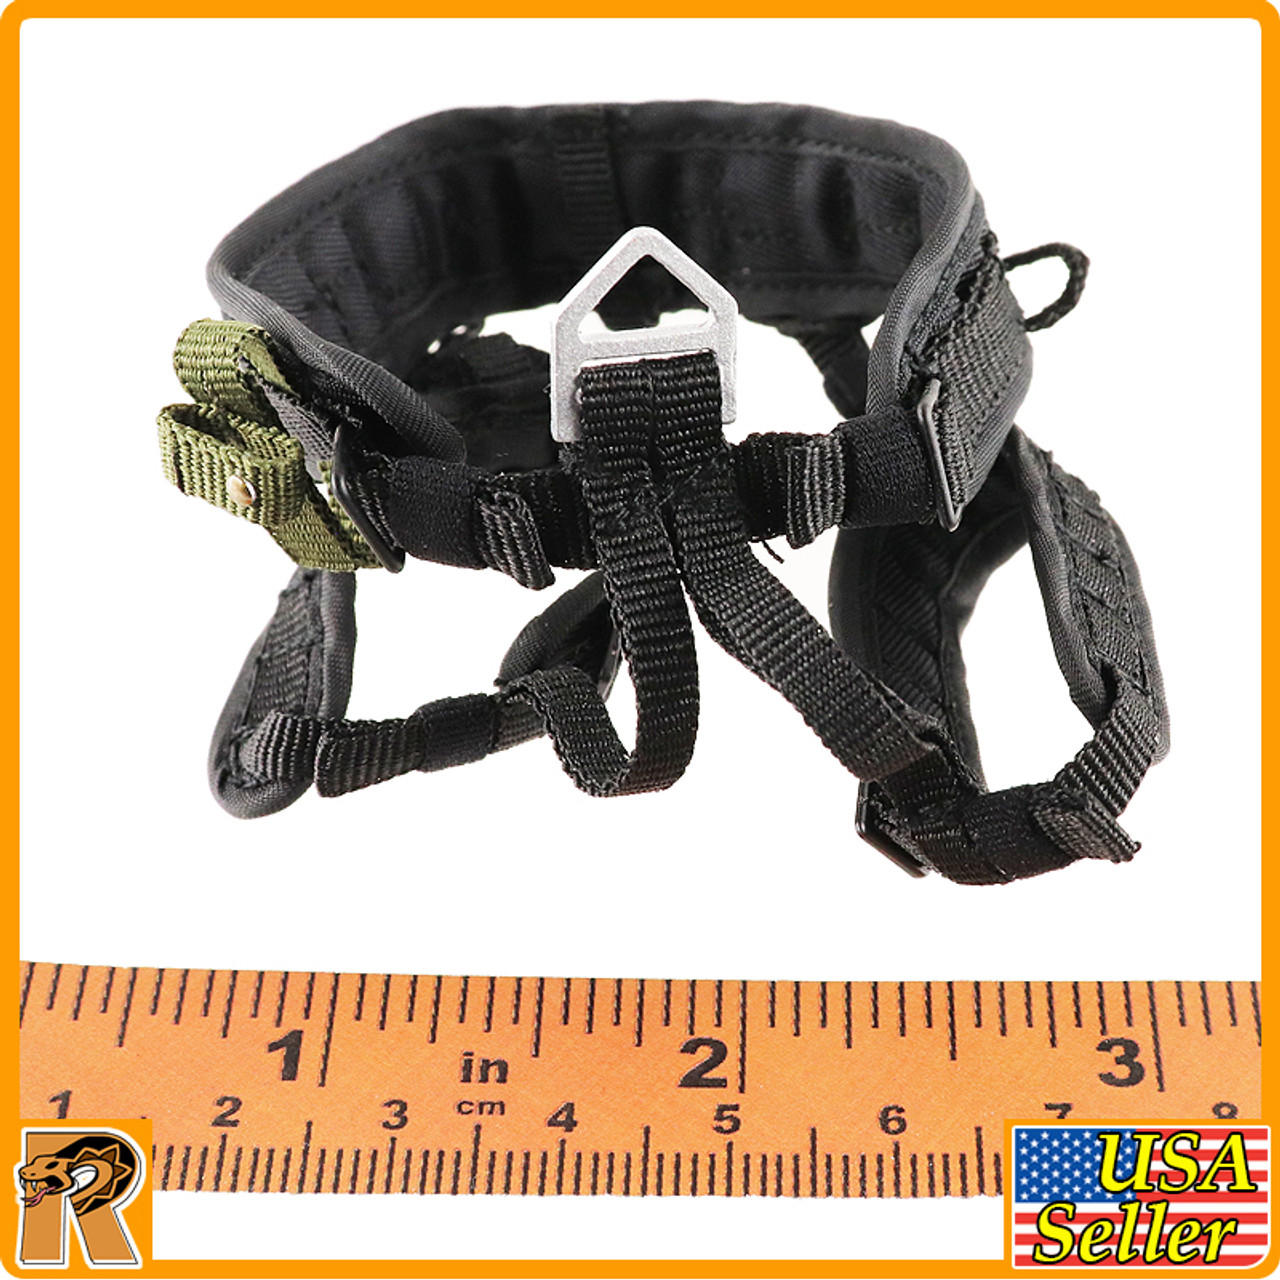 China SWAT Shandian Commando - Lowering Harness - 1/6 Scale -